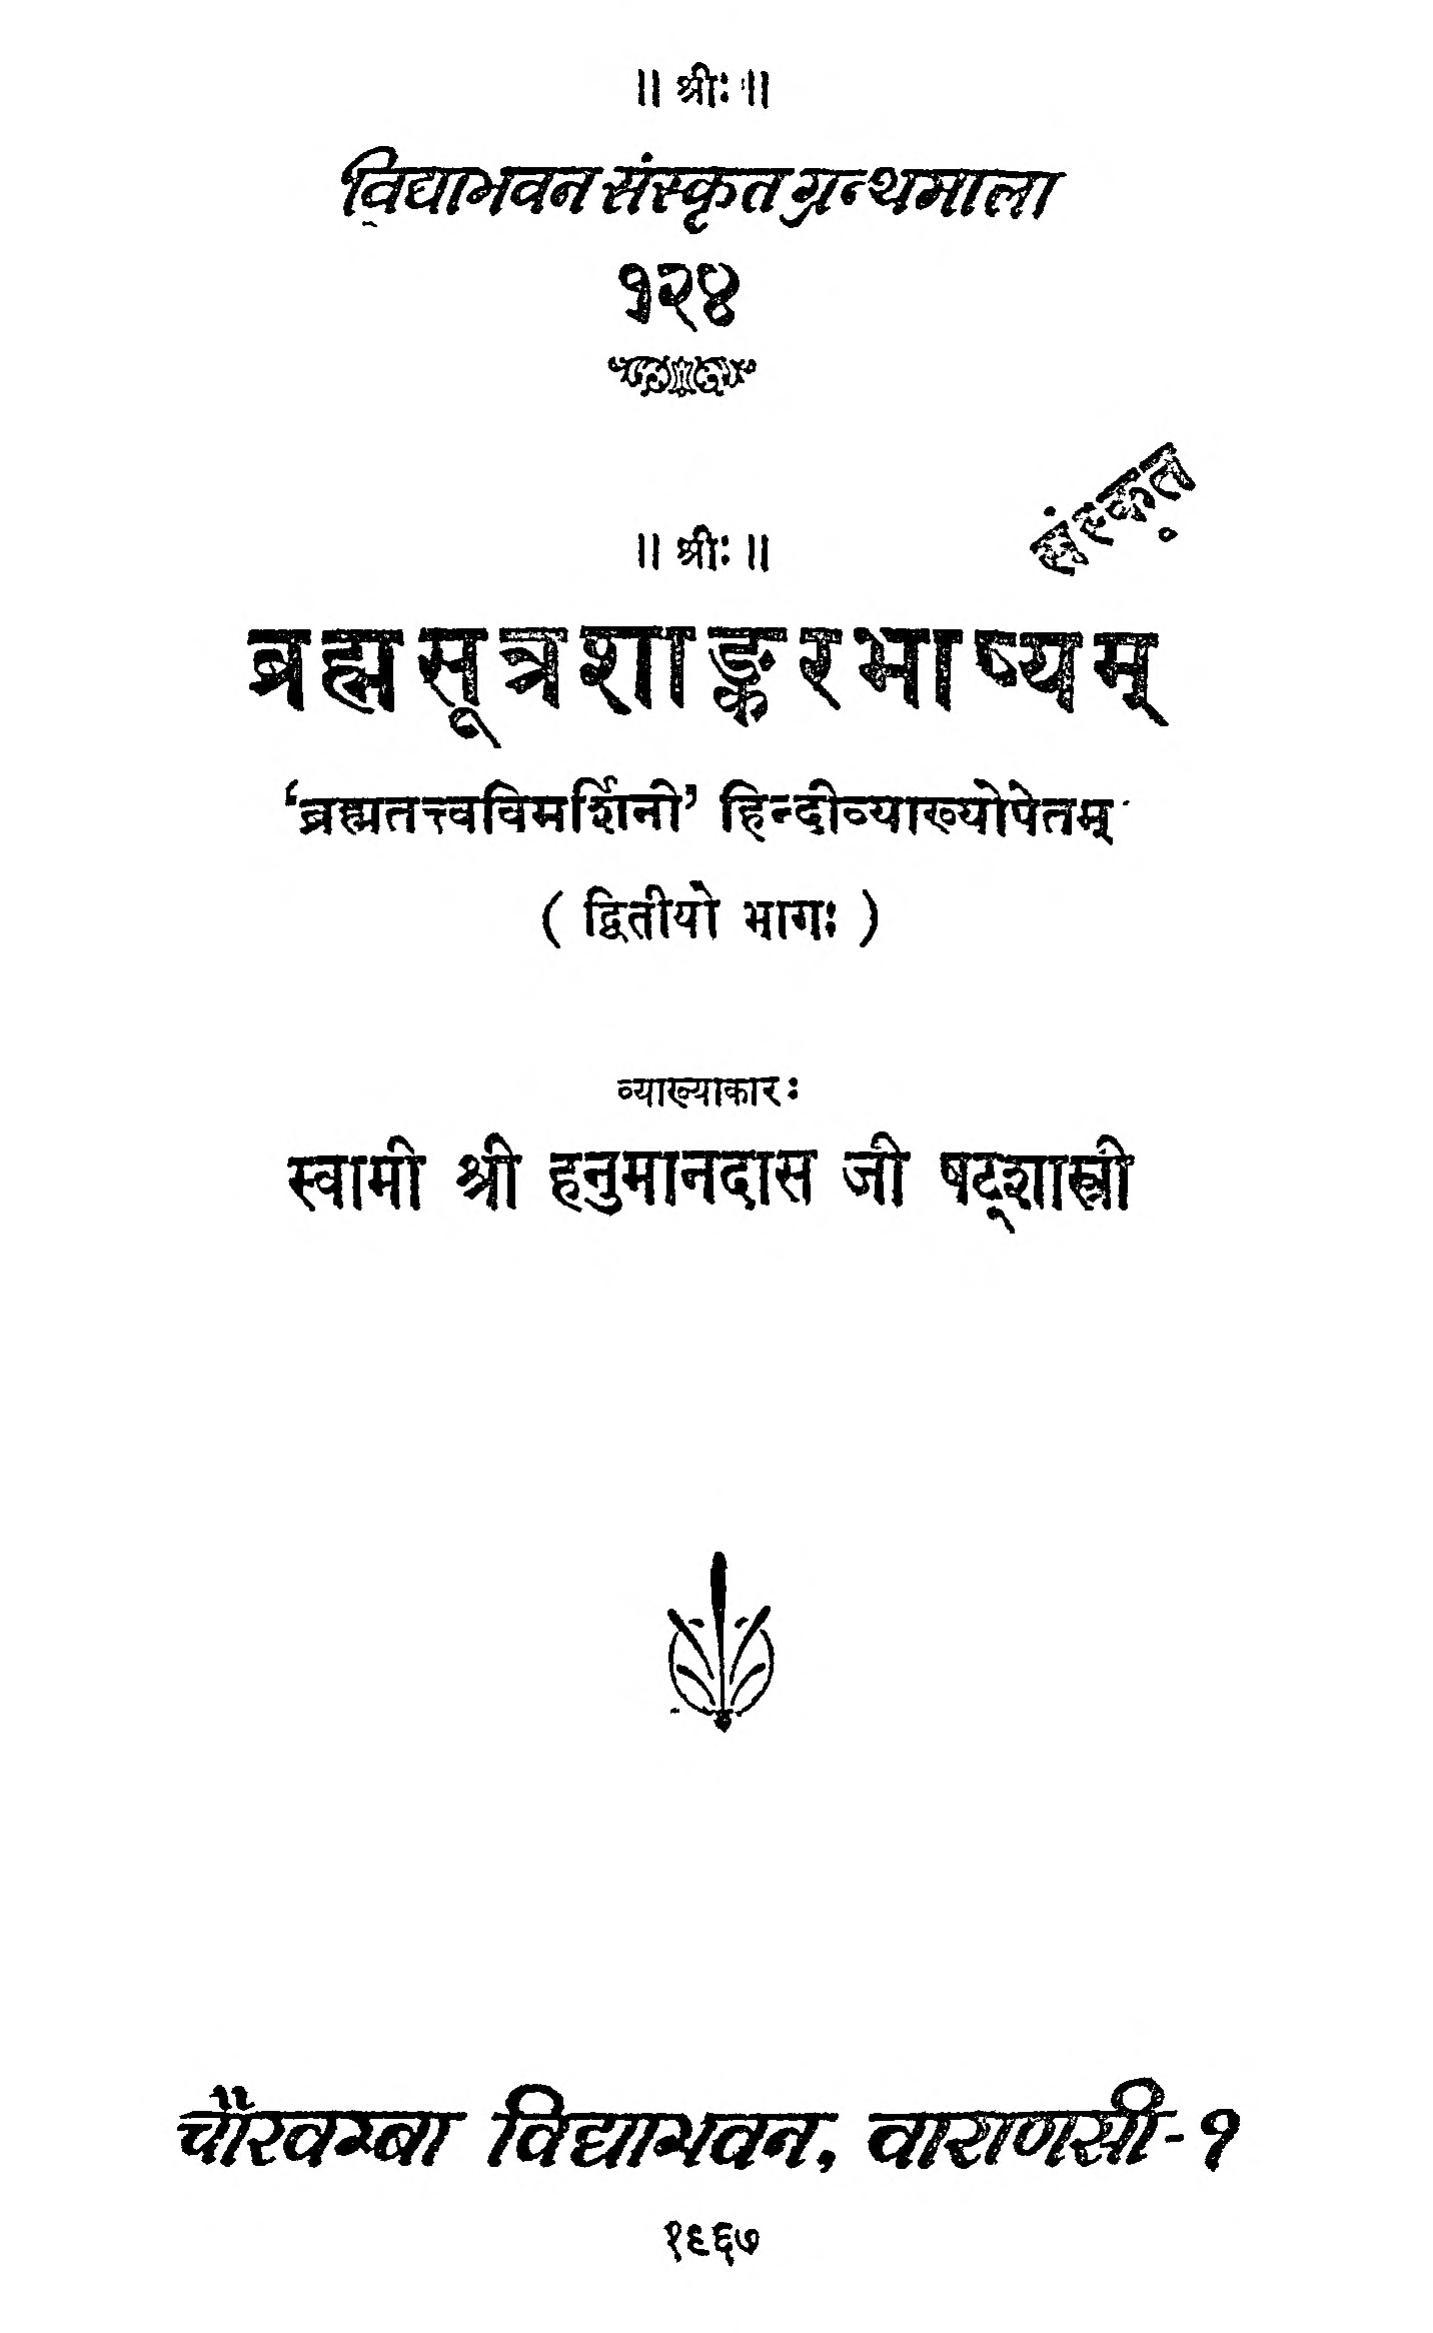 Brahmasutra Sankarabhasya by हनुमानदास जी - Hanumandaas Ji